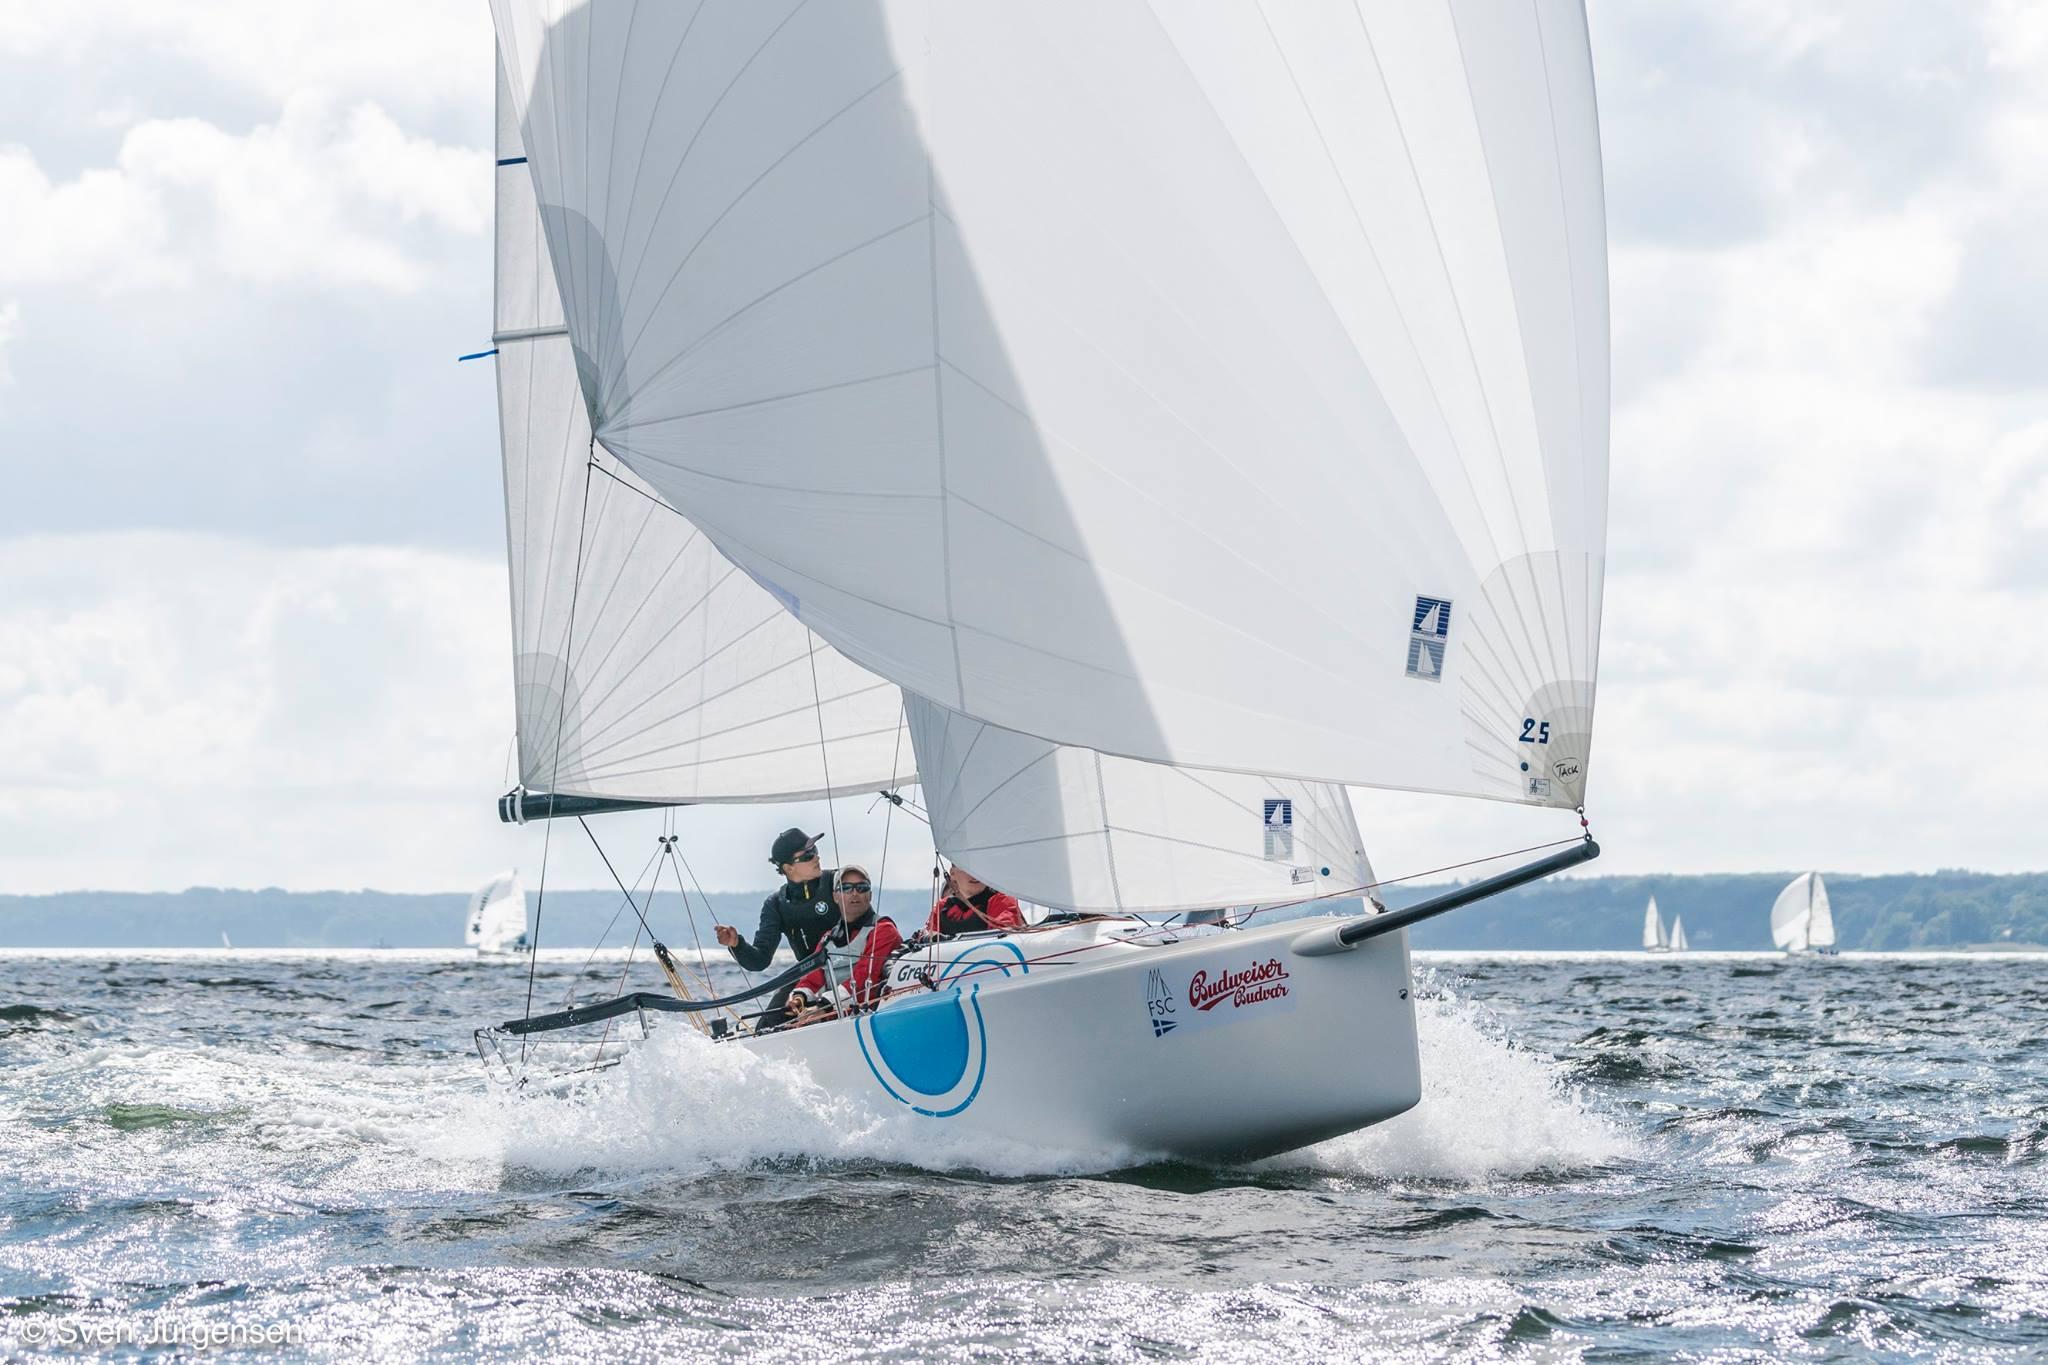 Upffront J70 With Harken Furler